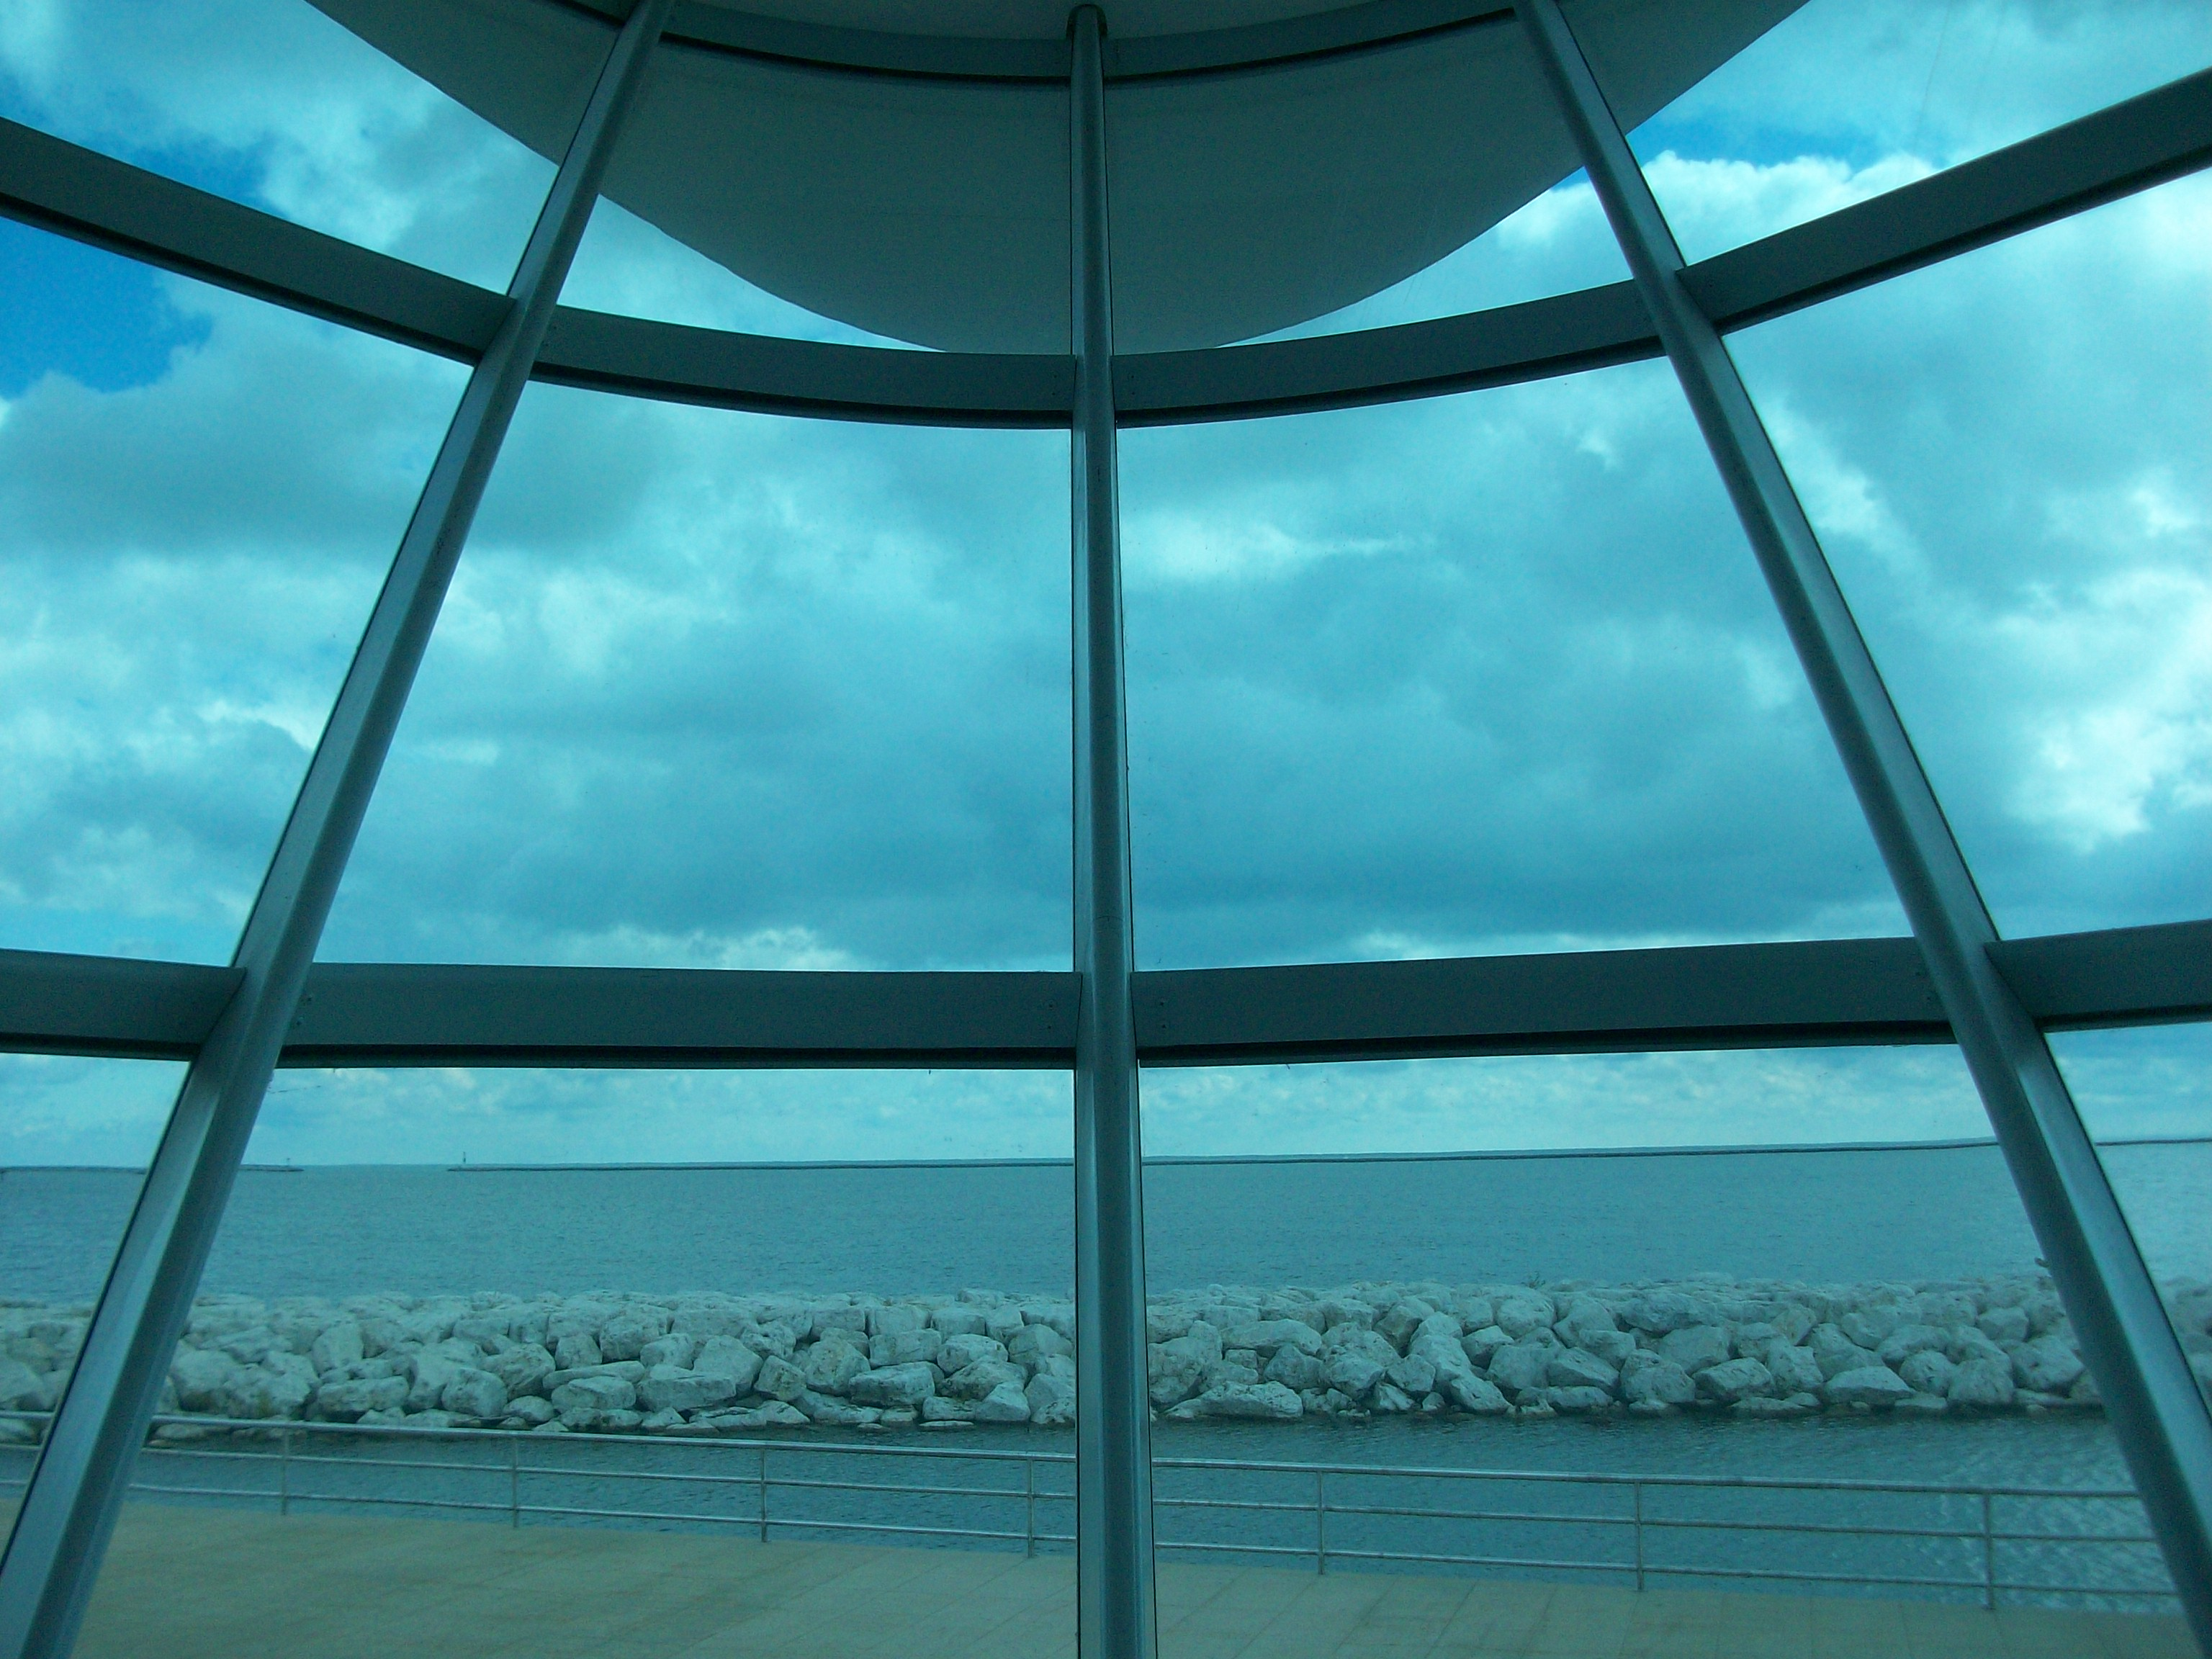 Calatrava's Milwaukee Art Museum View to the Lake